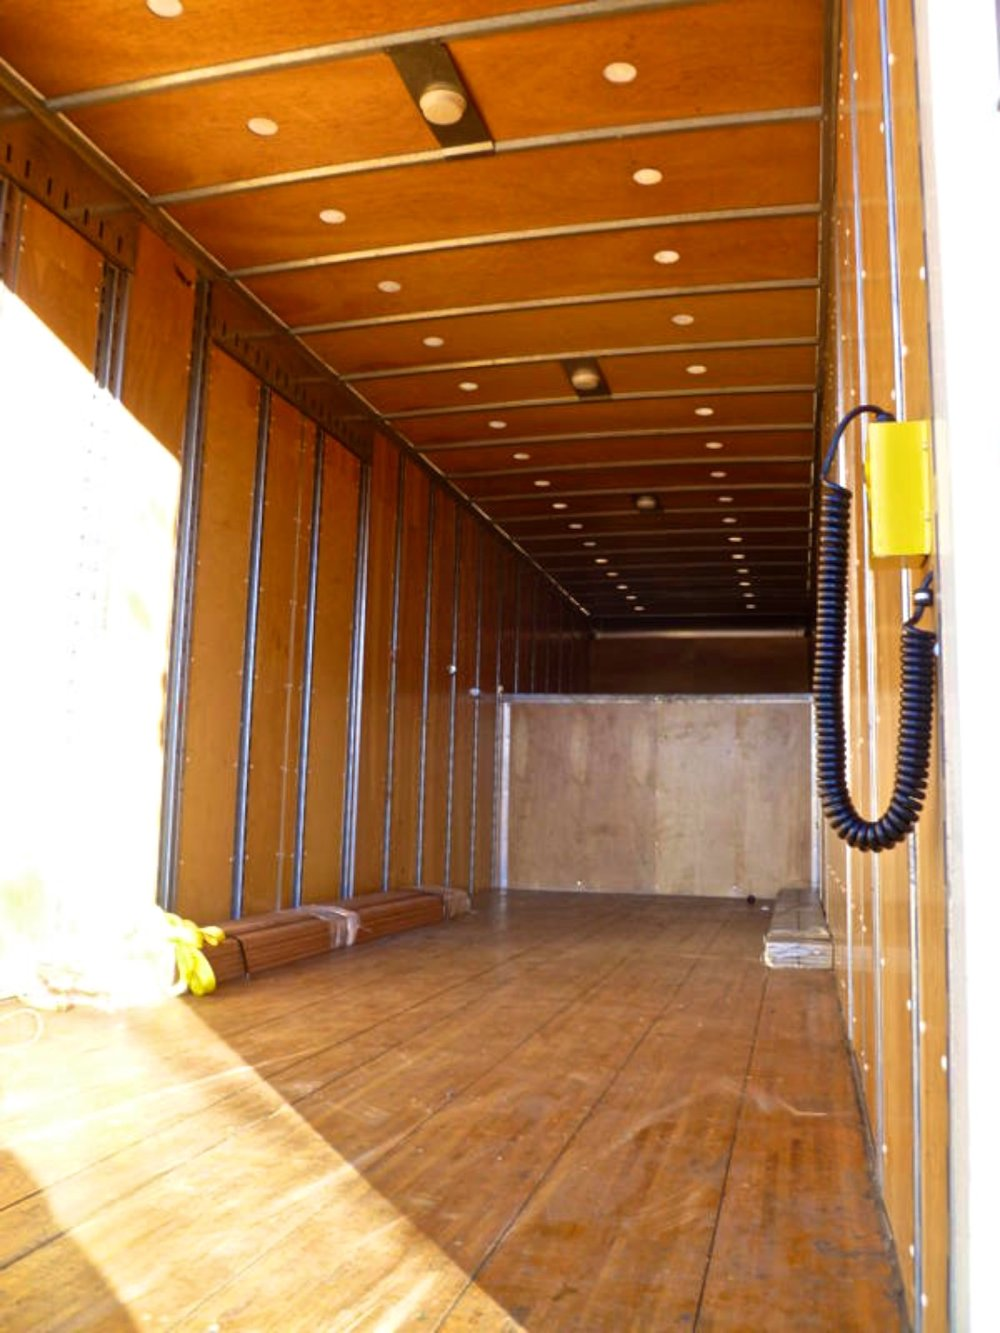 Cargo Cupola web 4344.jpg